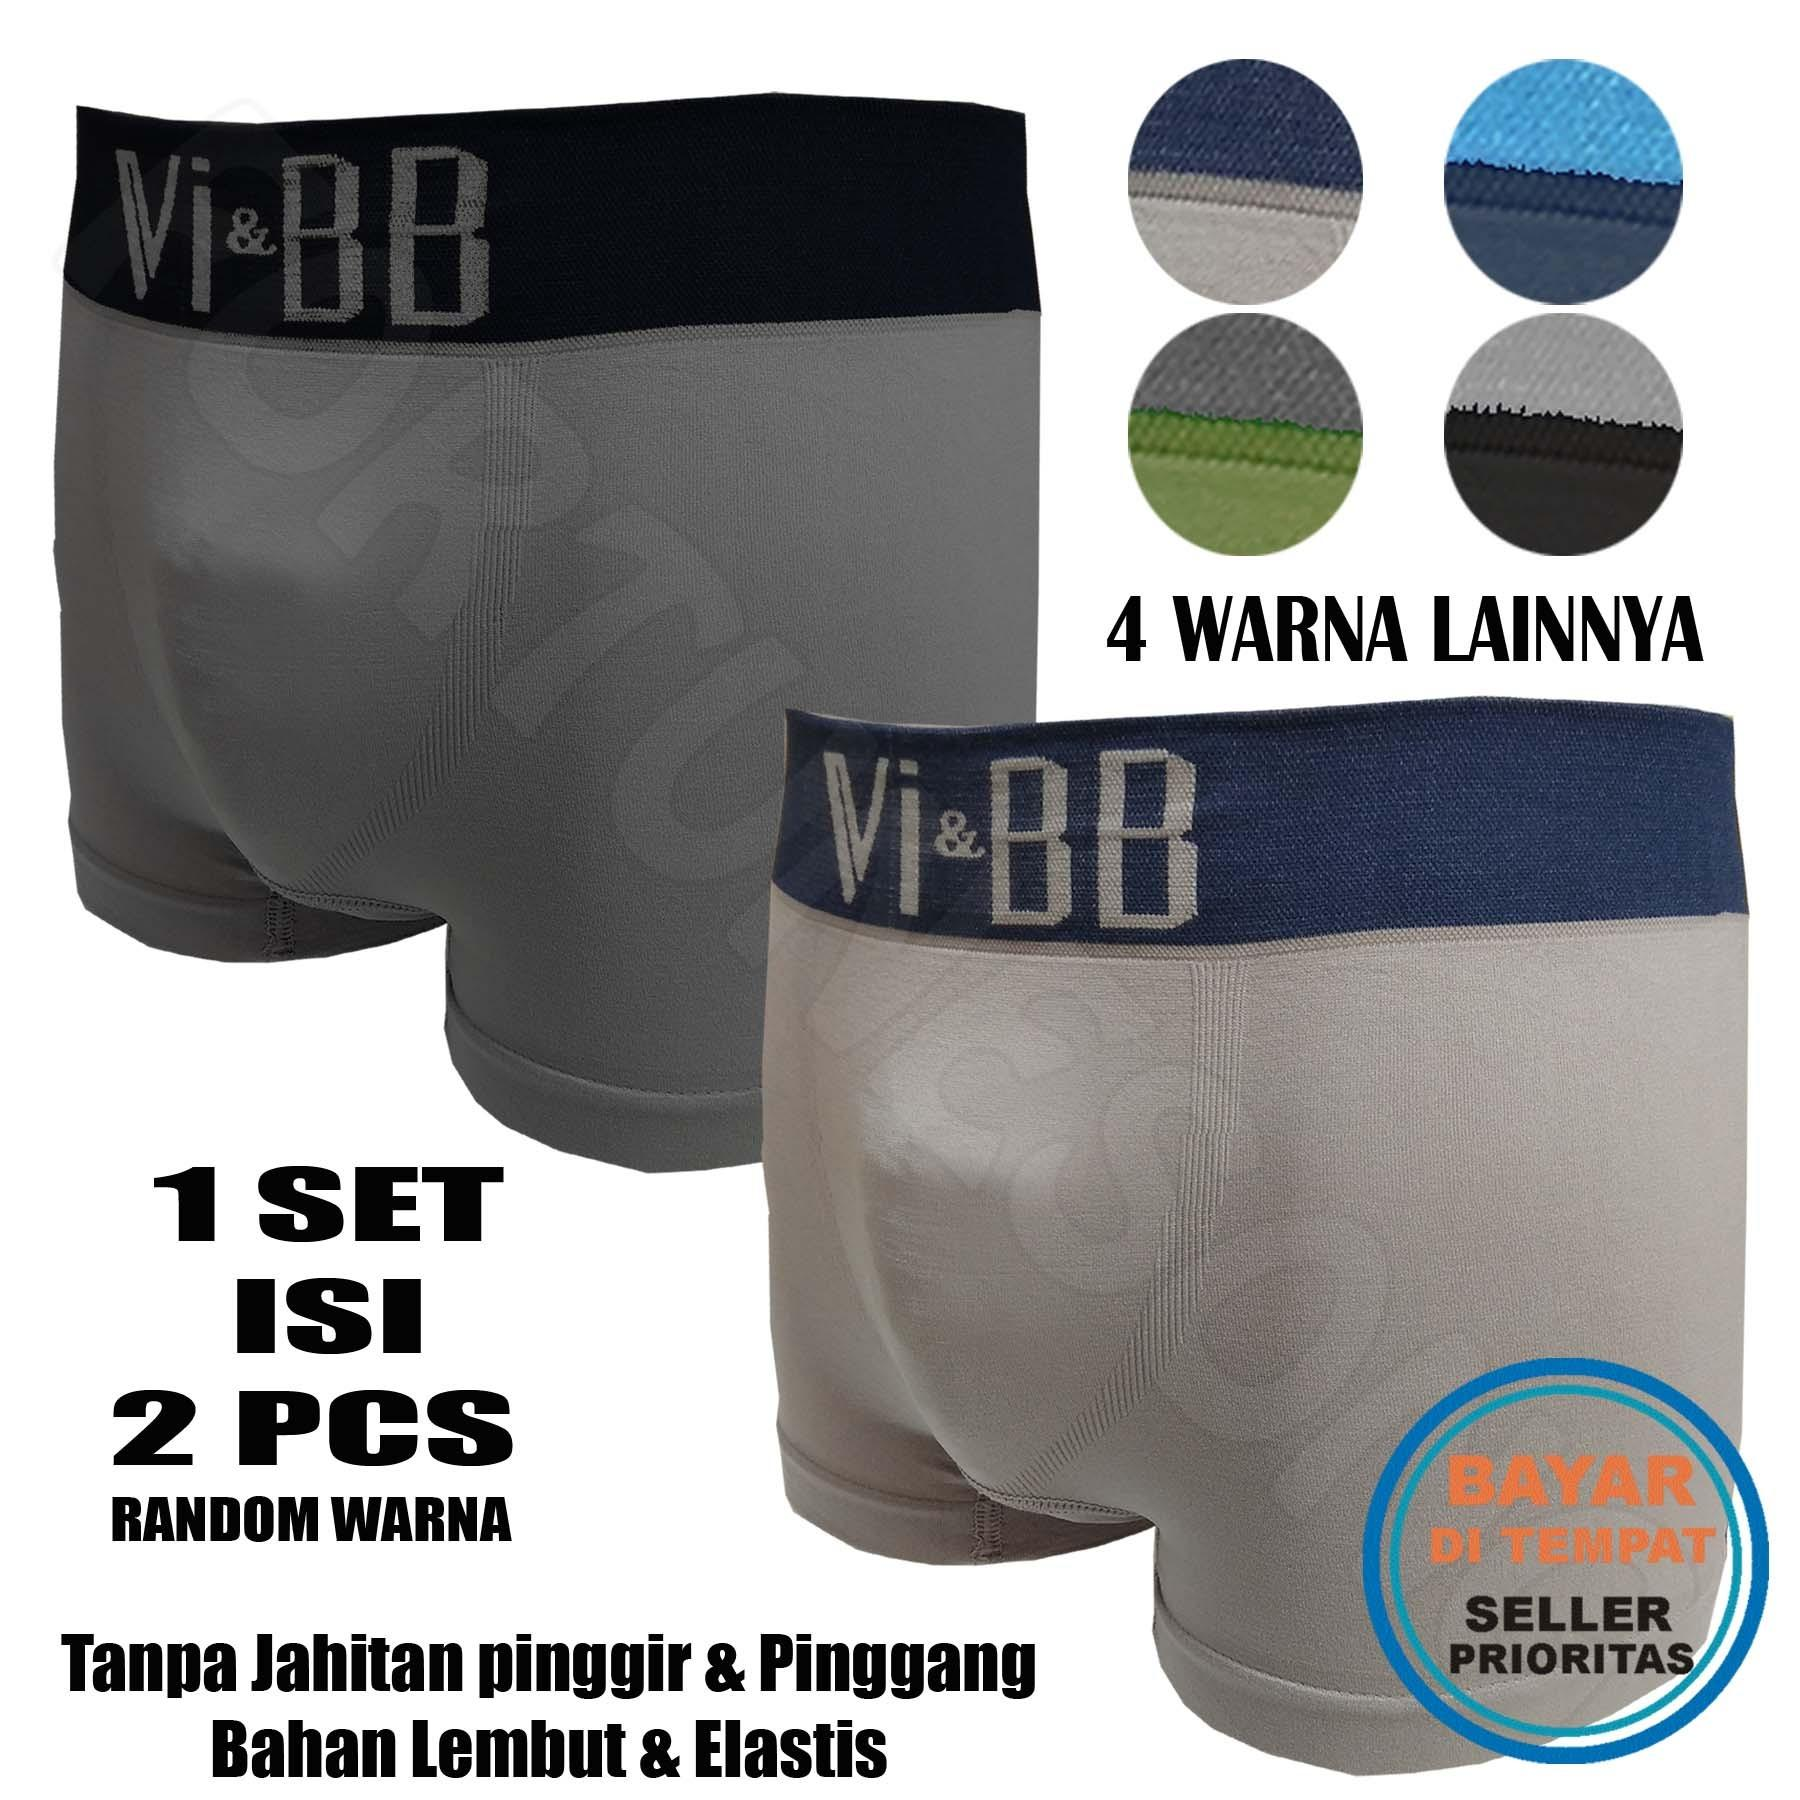 Promo Fs Fashion 2 Pcs Mens Underwear Celana Dalam Boxer Pria Premium Di Jawa Barat